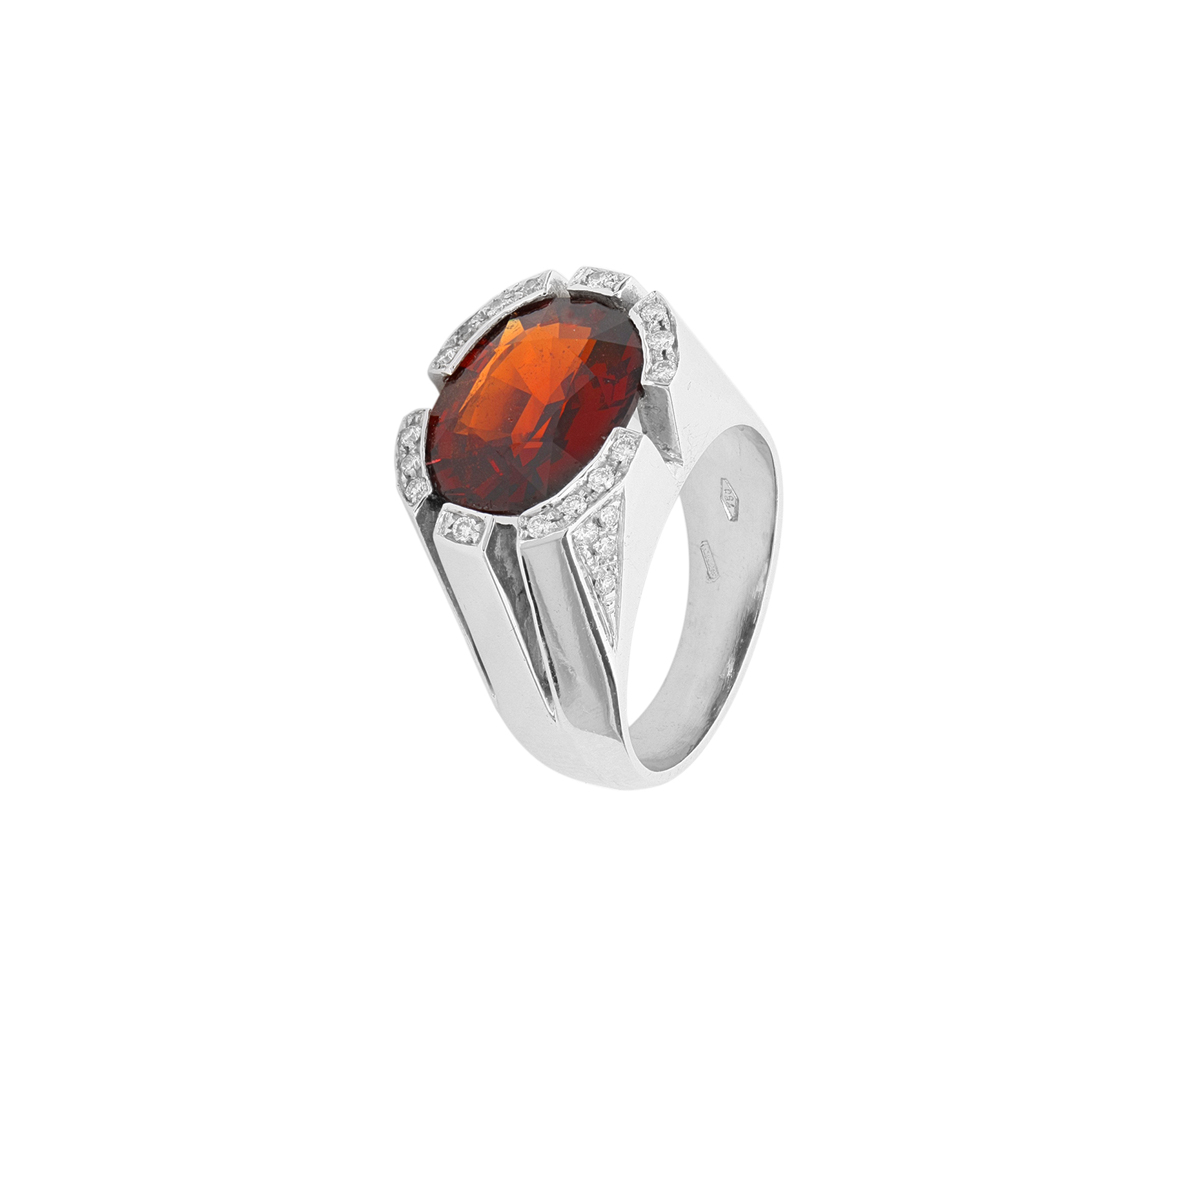 Modern Orange-Red Garnet Ring with Diamonds